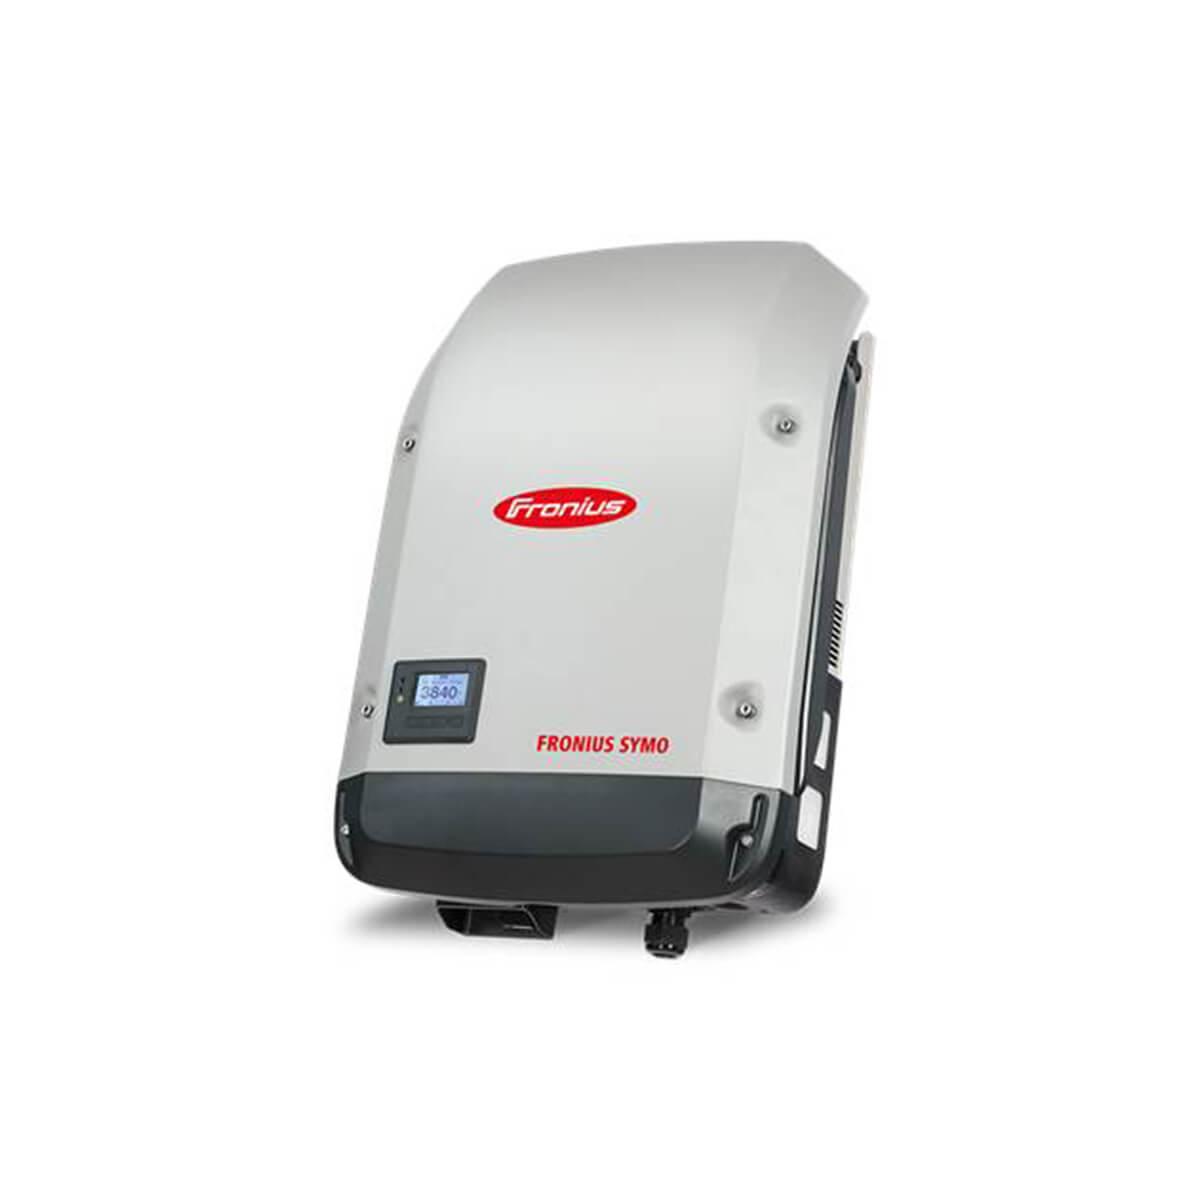 fronius 10kW inverter, fronius symo 10kW inverter, fronius symo 10.0-3-m inverter, fronius symo 10.0-3-m, fronius symo 10 kW